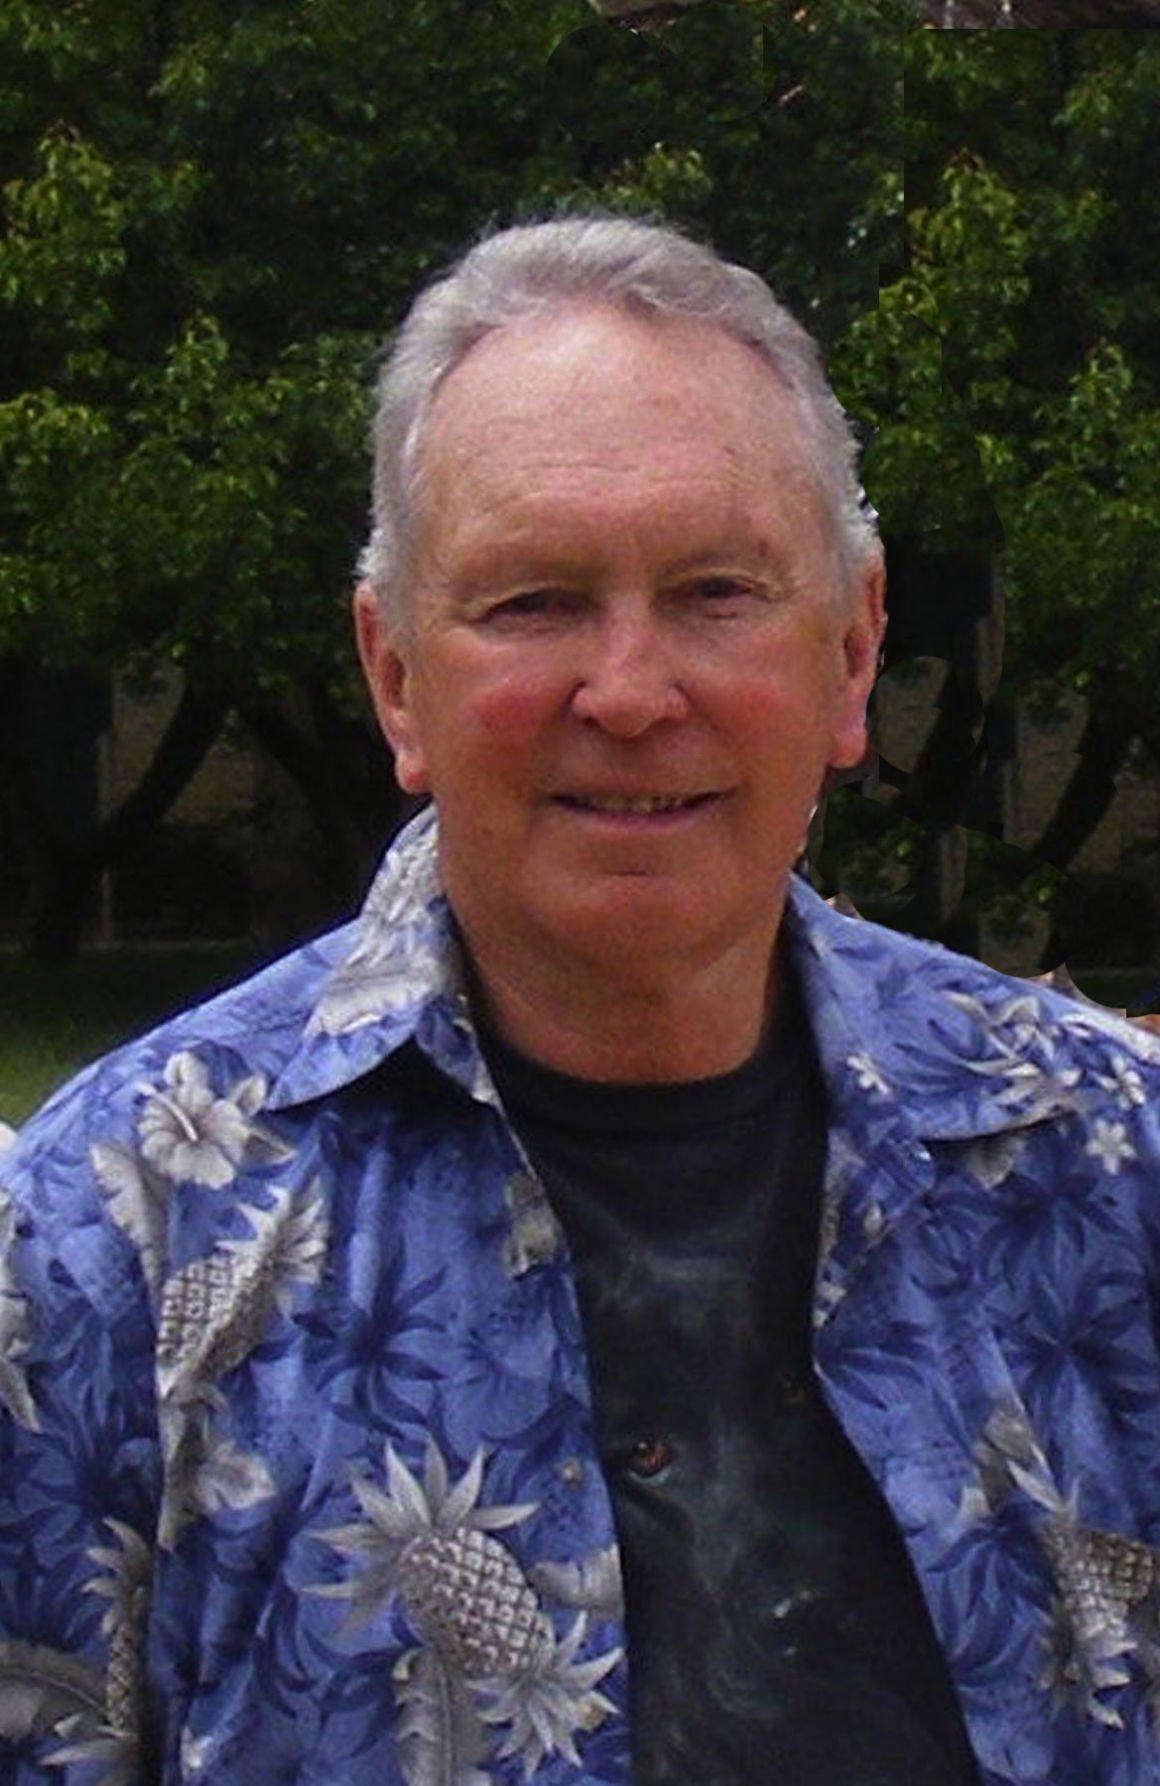 Gerald Haslam